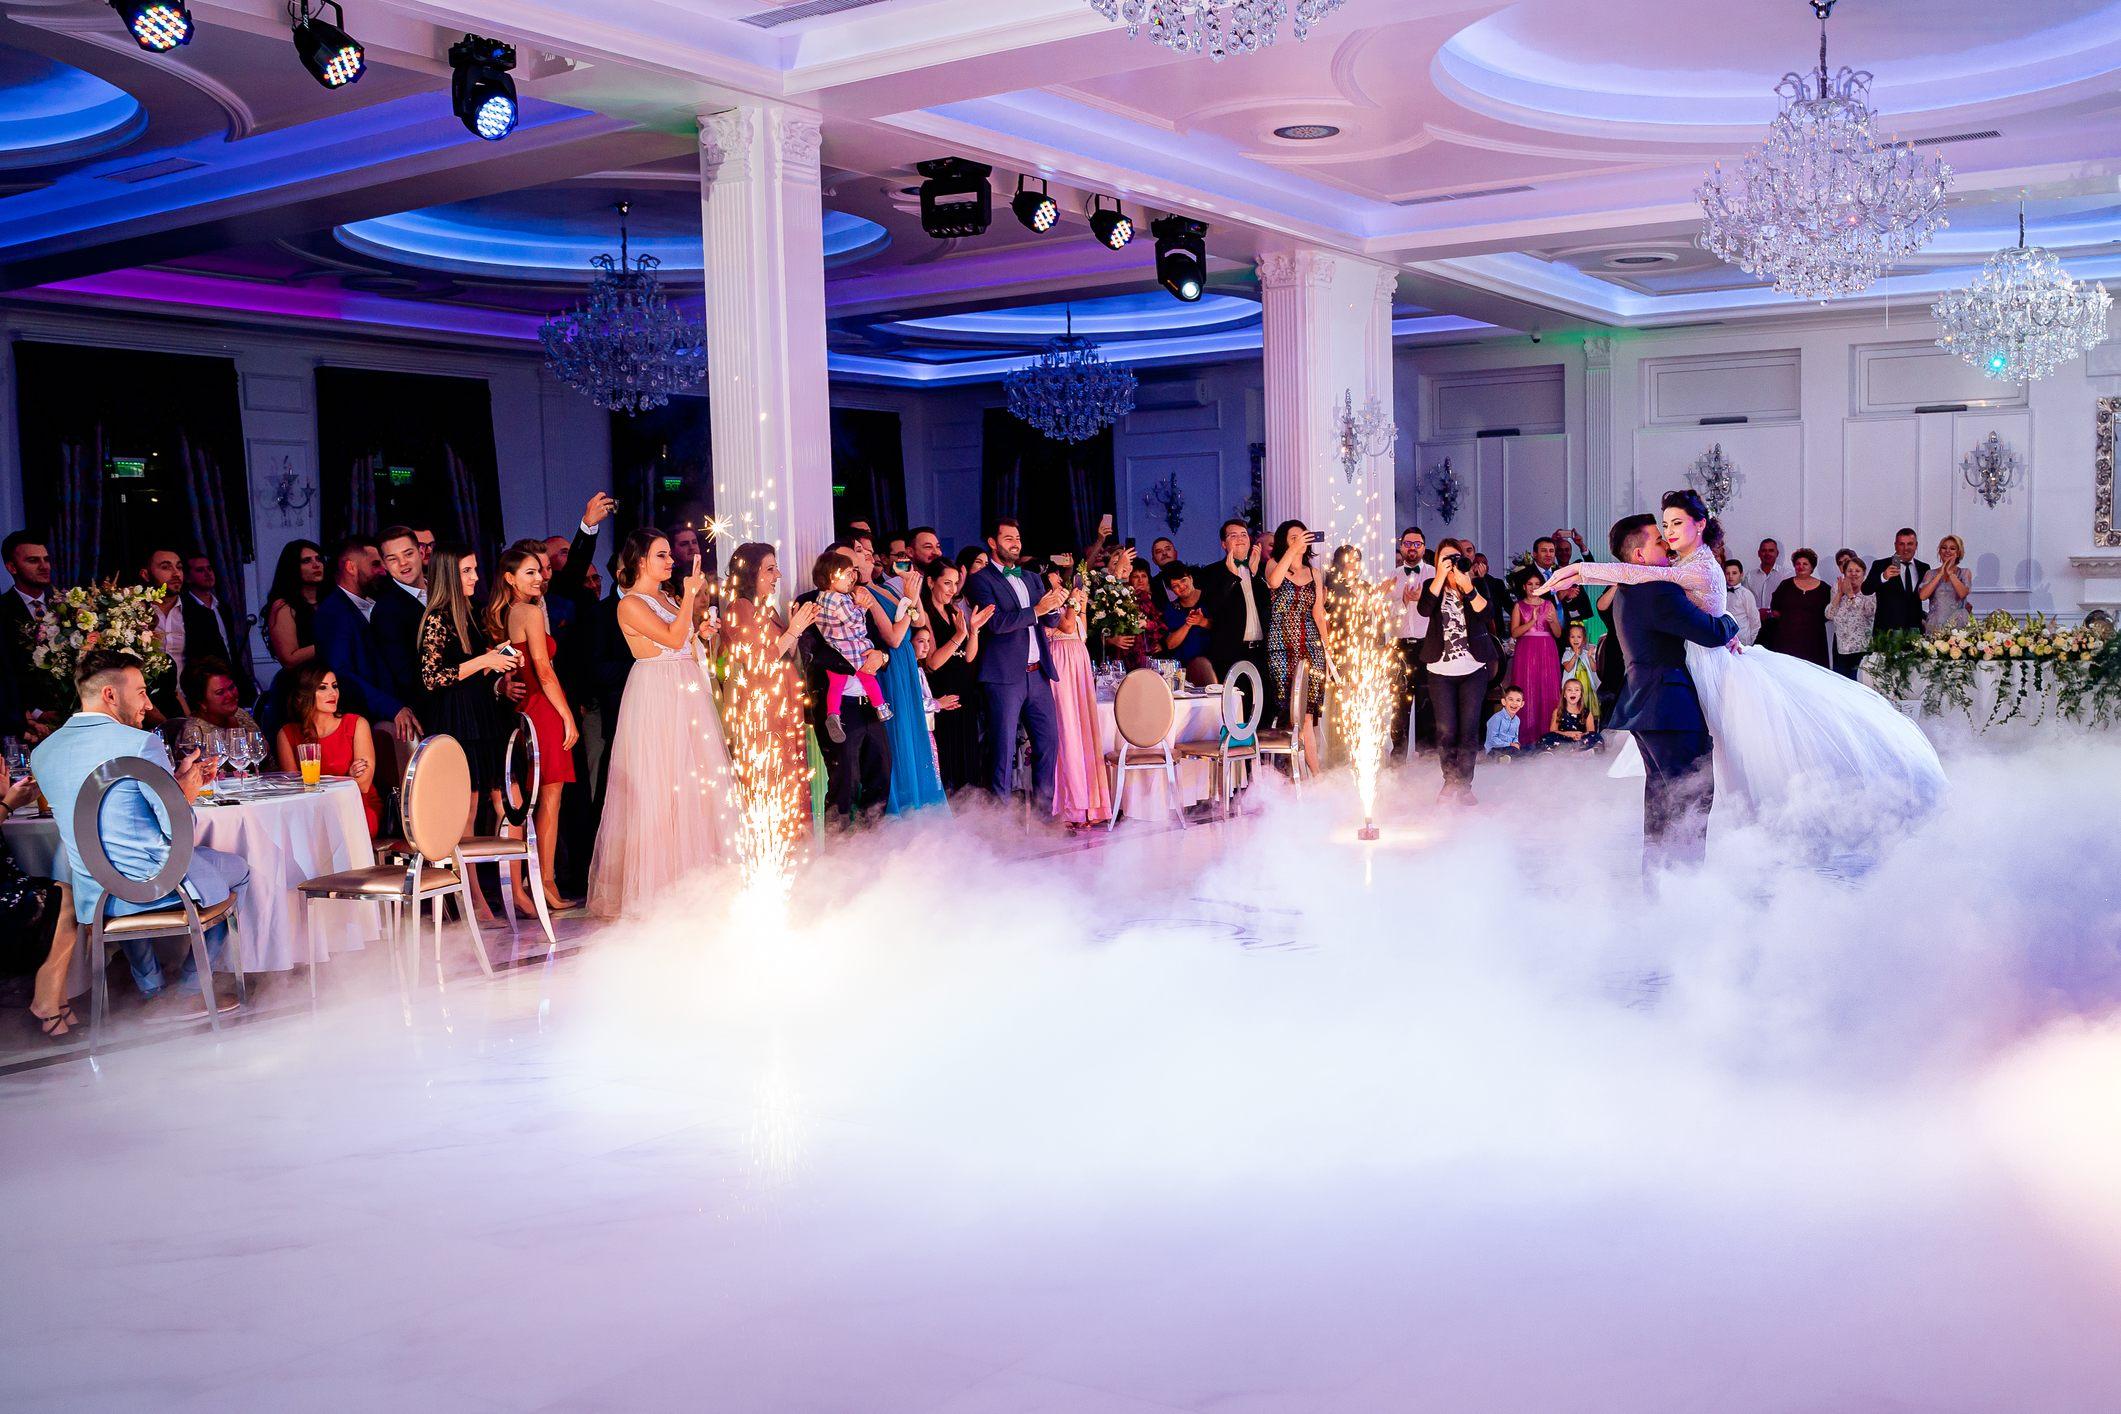 fotograf nunta bucuresti laurentiu nica  25 - Lorena & Matei | Fotografii nunta Bucuresti | Restaurant Domeniul cu Ciresi